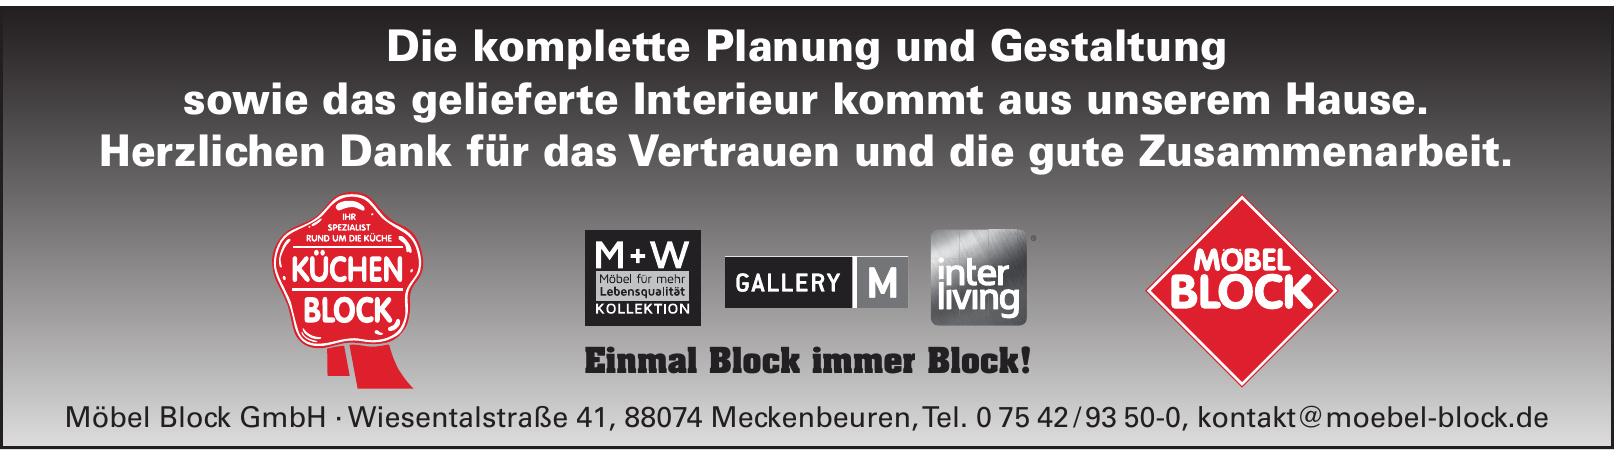 Möbel Block GmbH